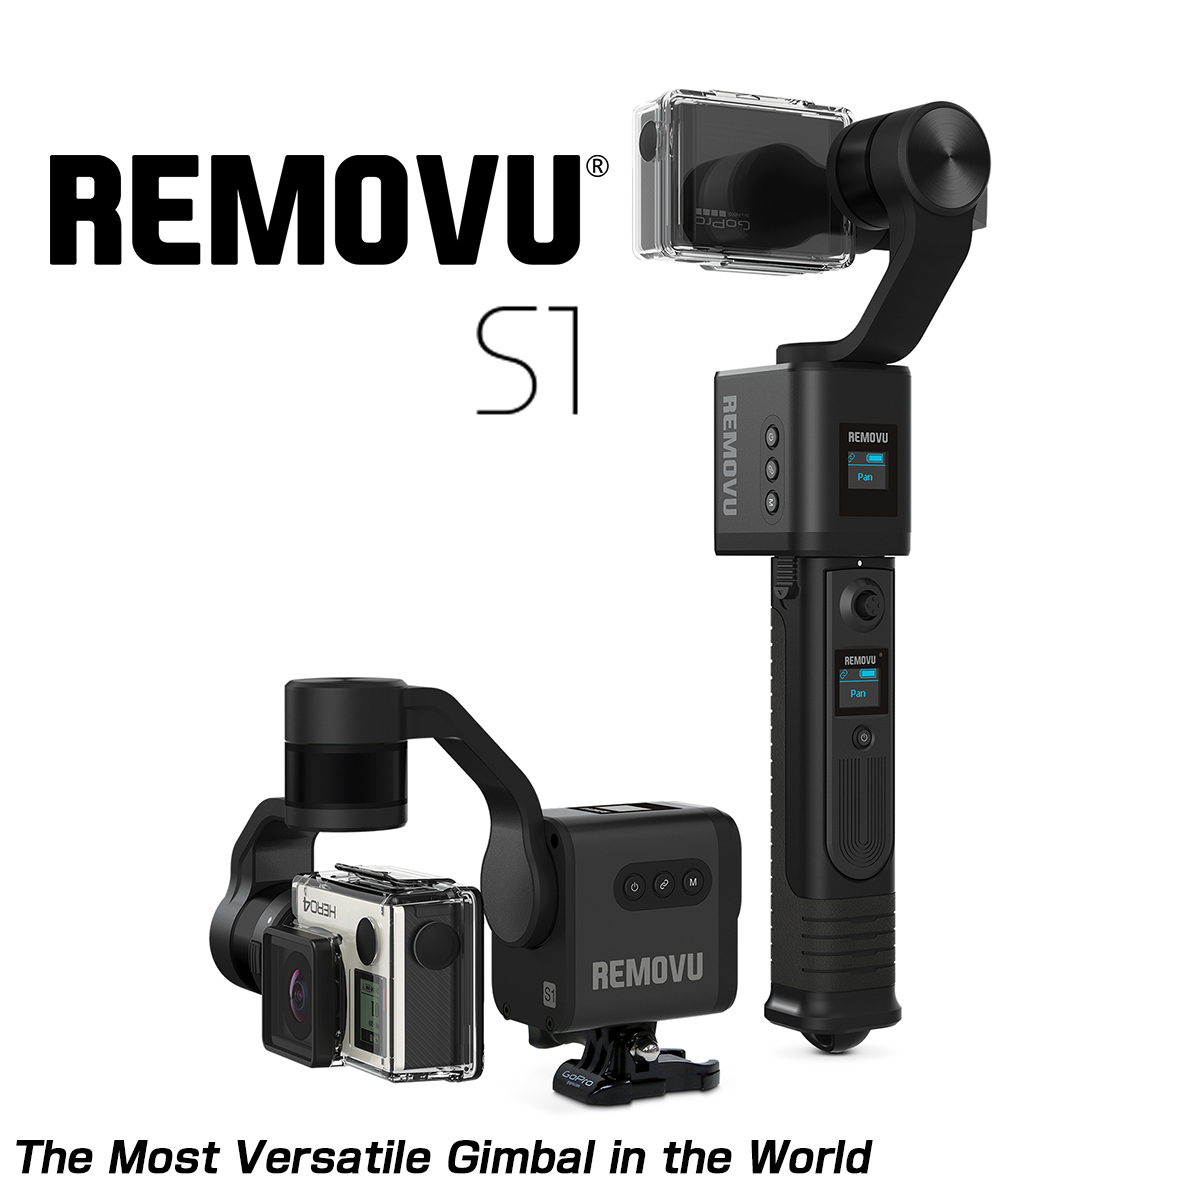 【MOTO禅】REMOVU S1 智能方向支架 GoPro相機/Sony相機/iPhone用